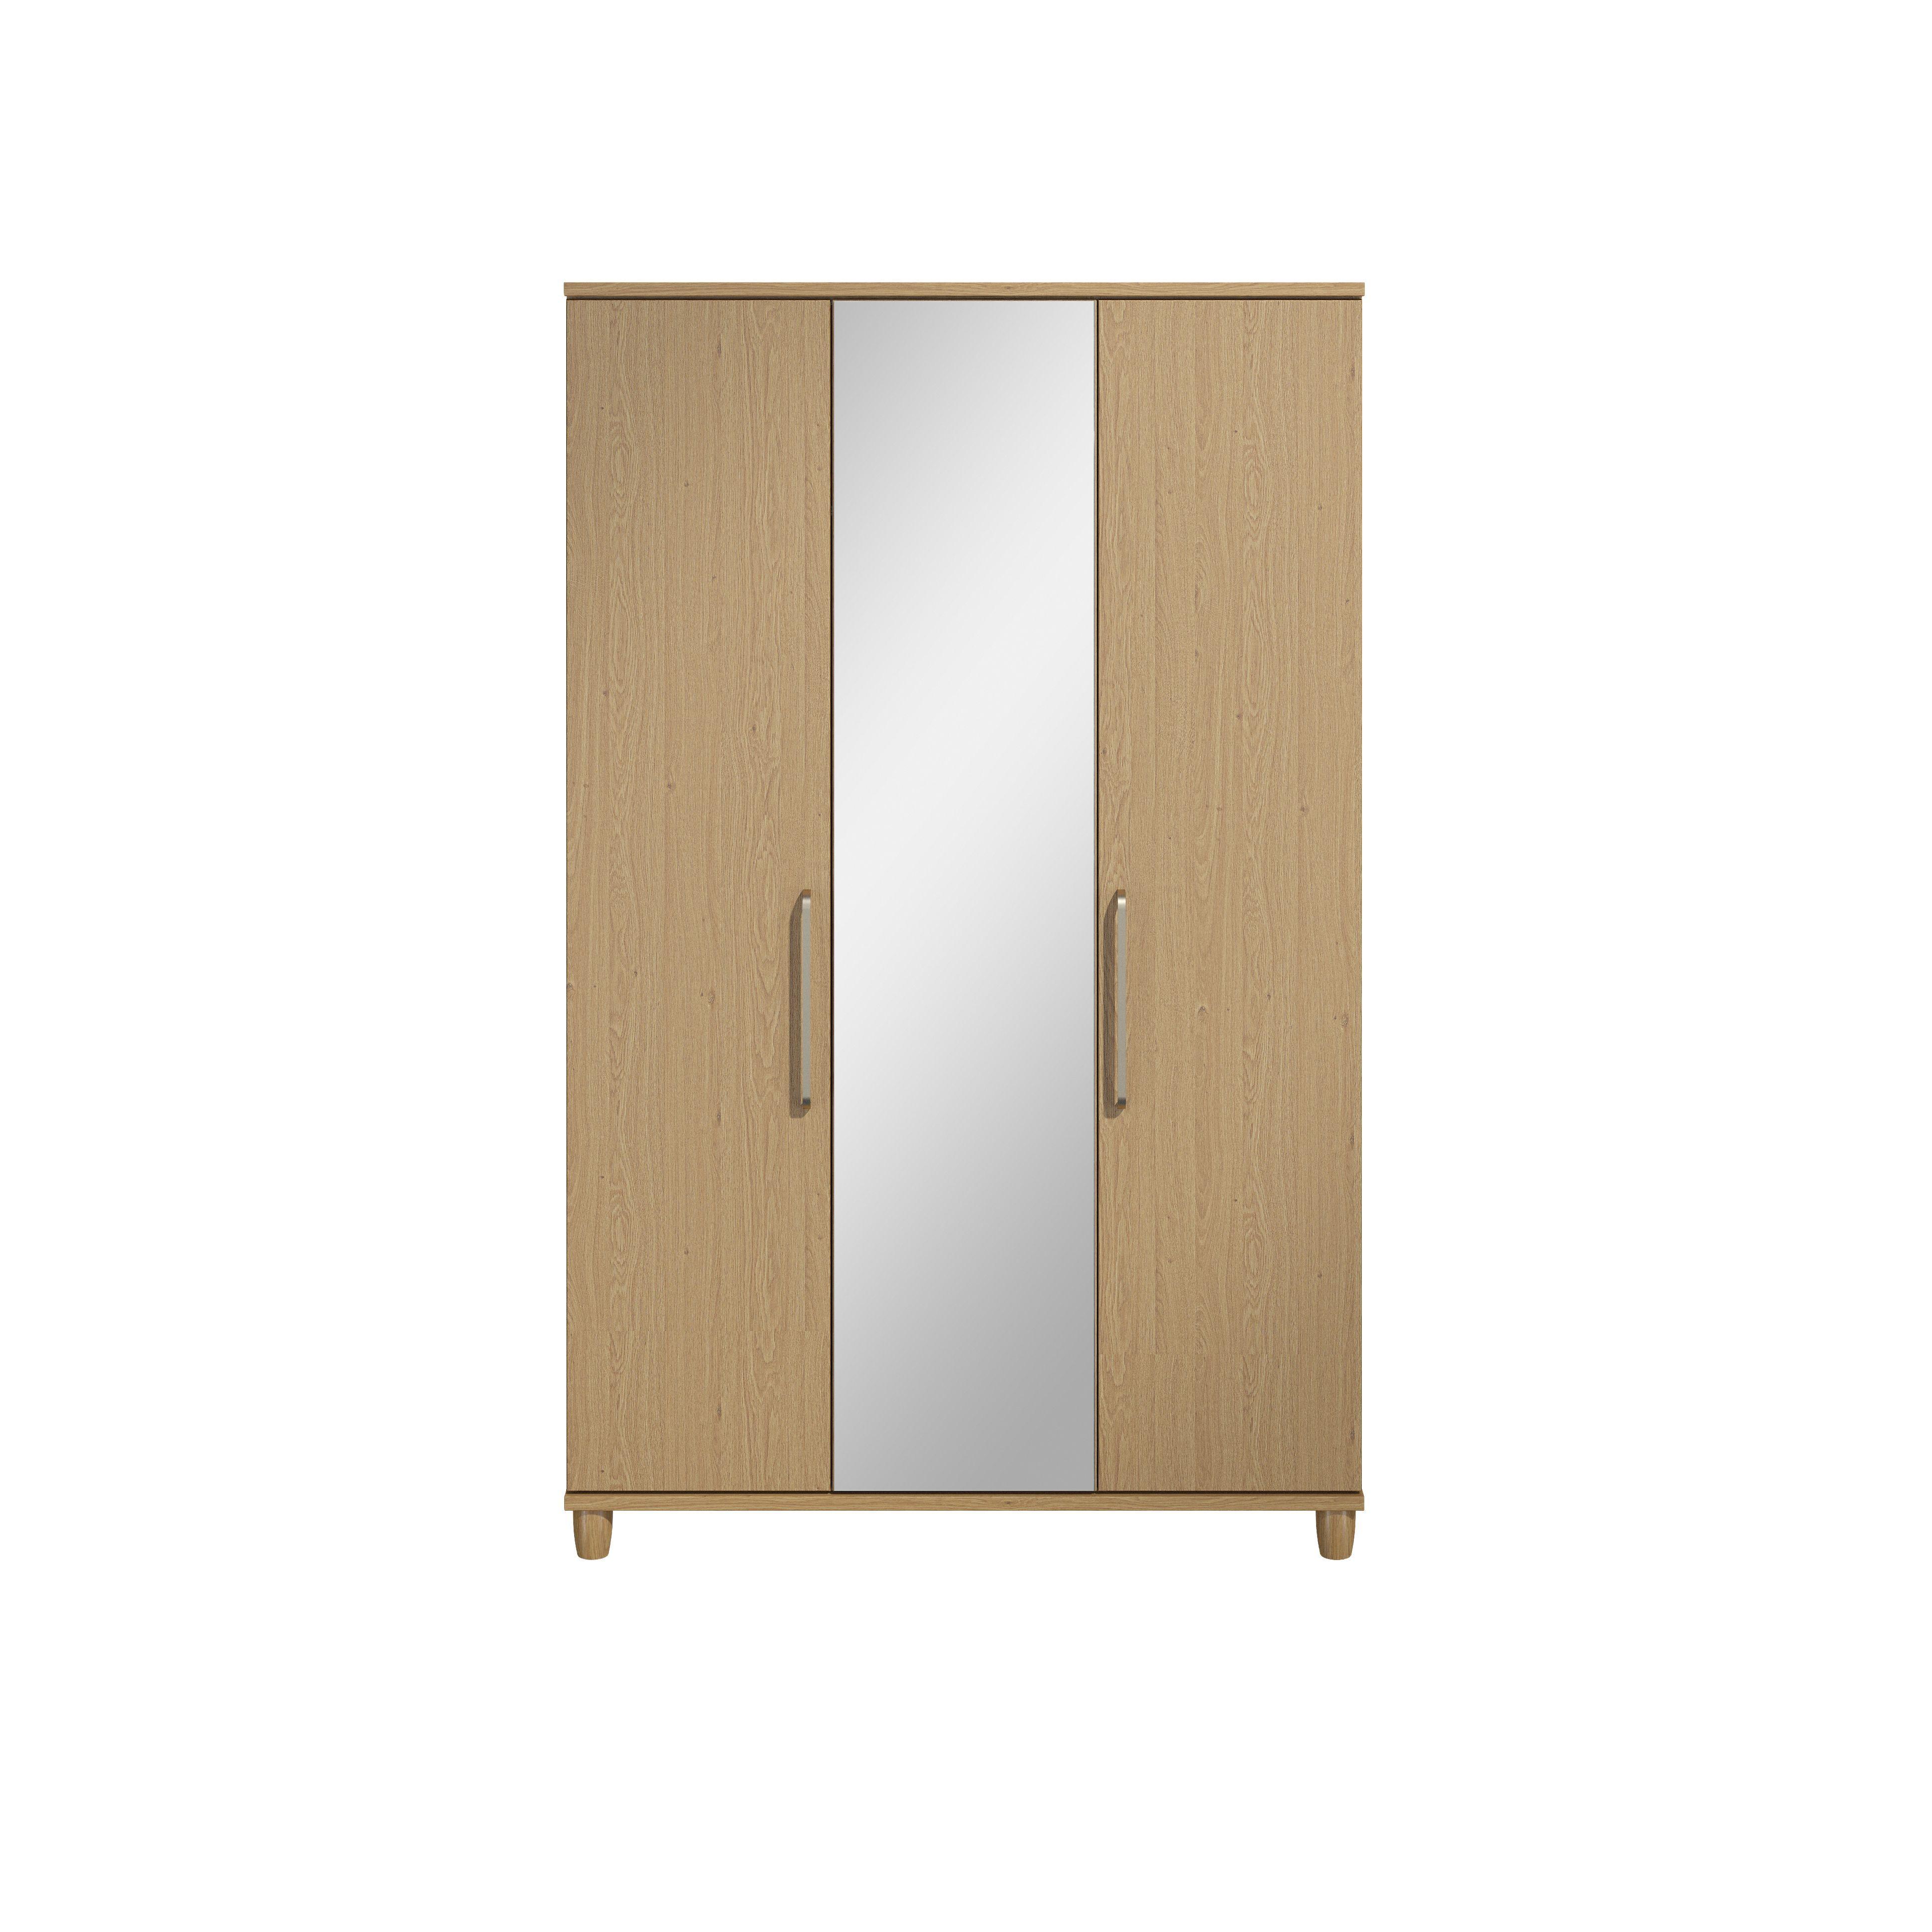 Pandora Oak Effect 3 Door Mirror Wardrobe H 1930mm W